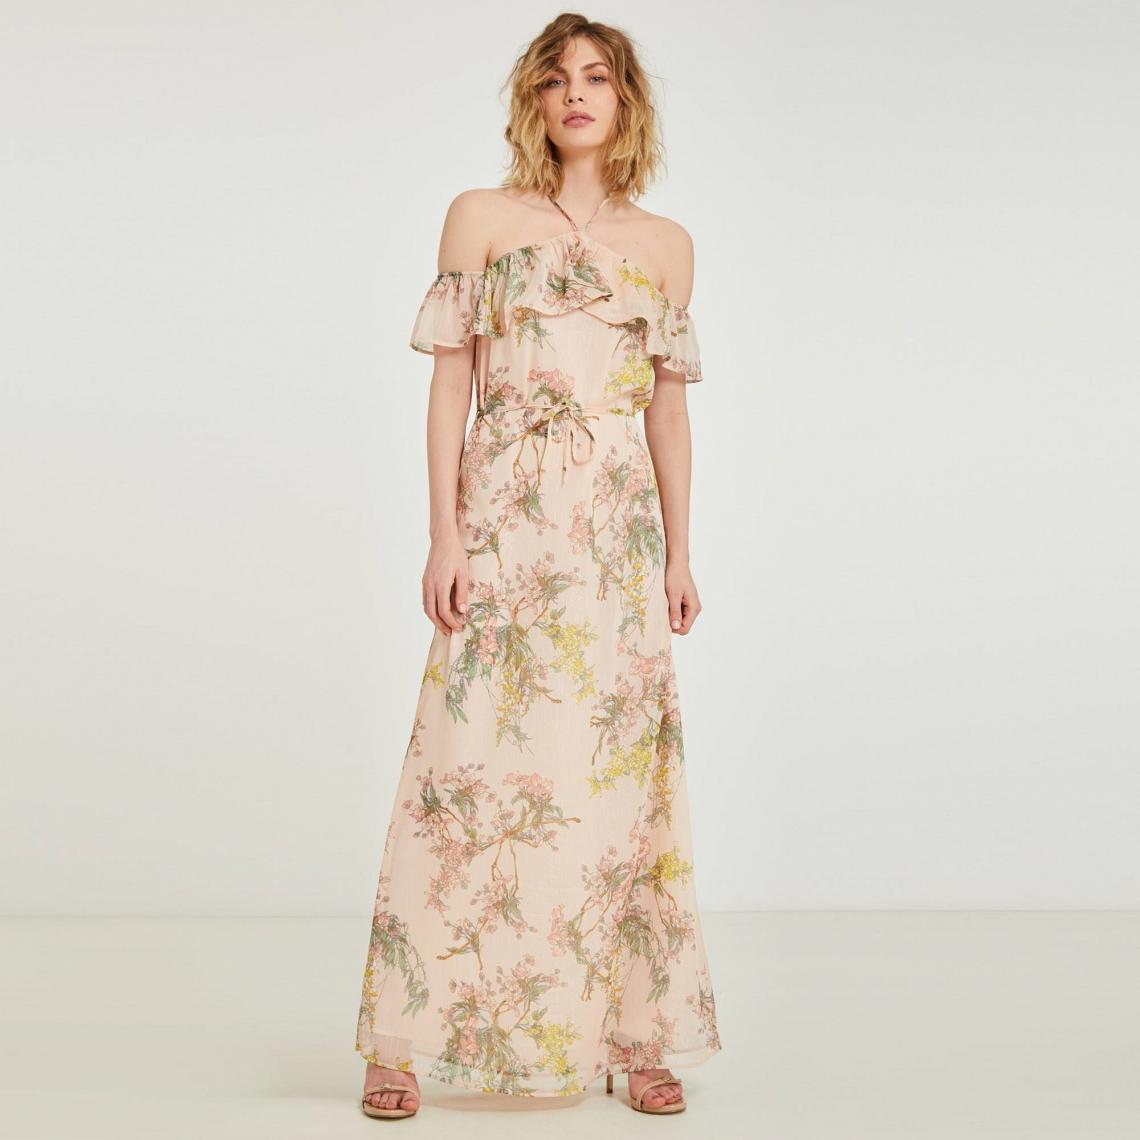 581498c8ba15b Robe longue imprimée encolure volantée femme Morgan - Rose Morgan Femme